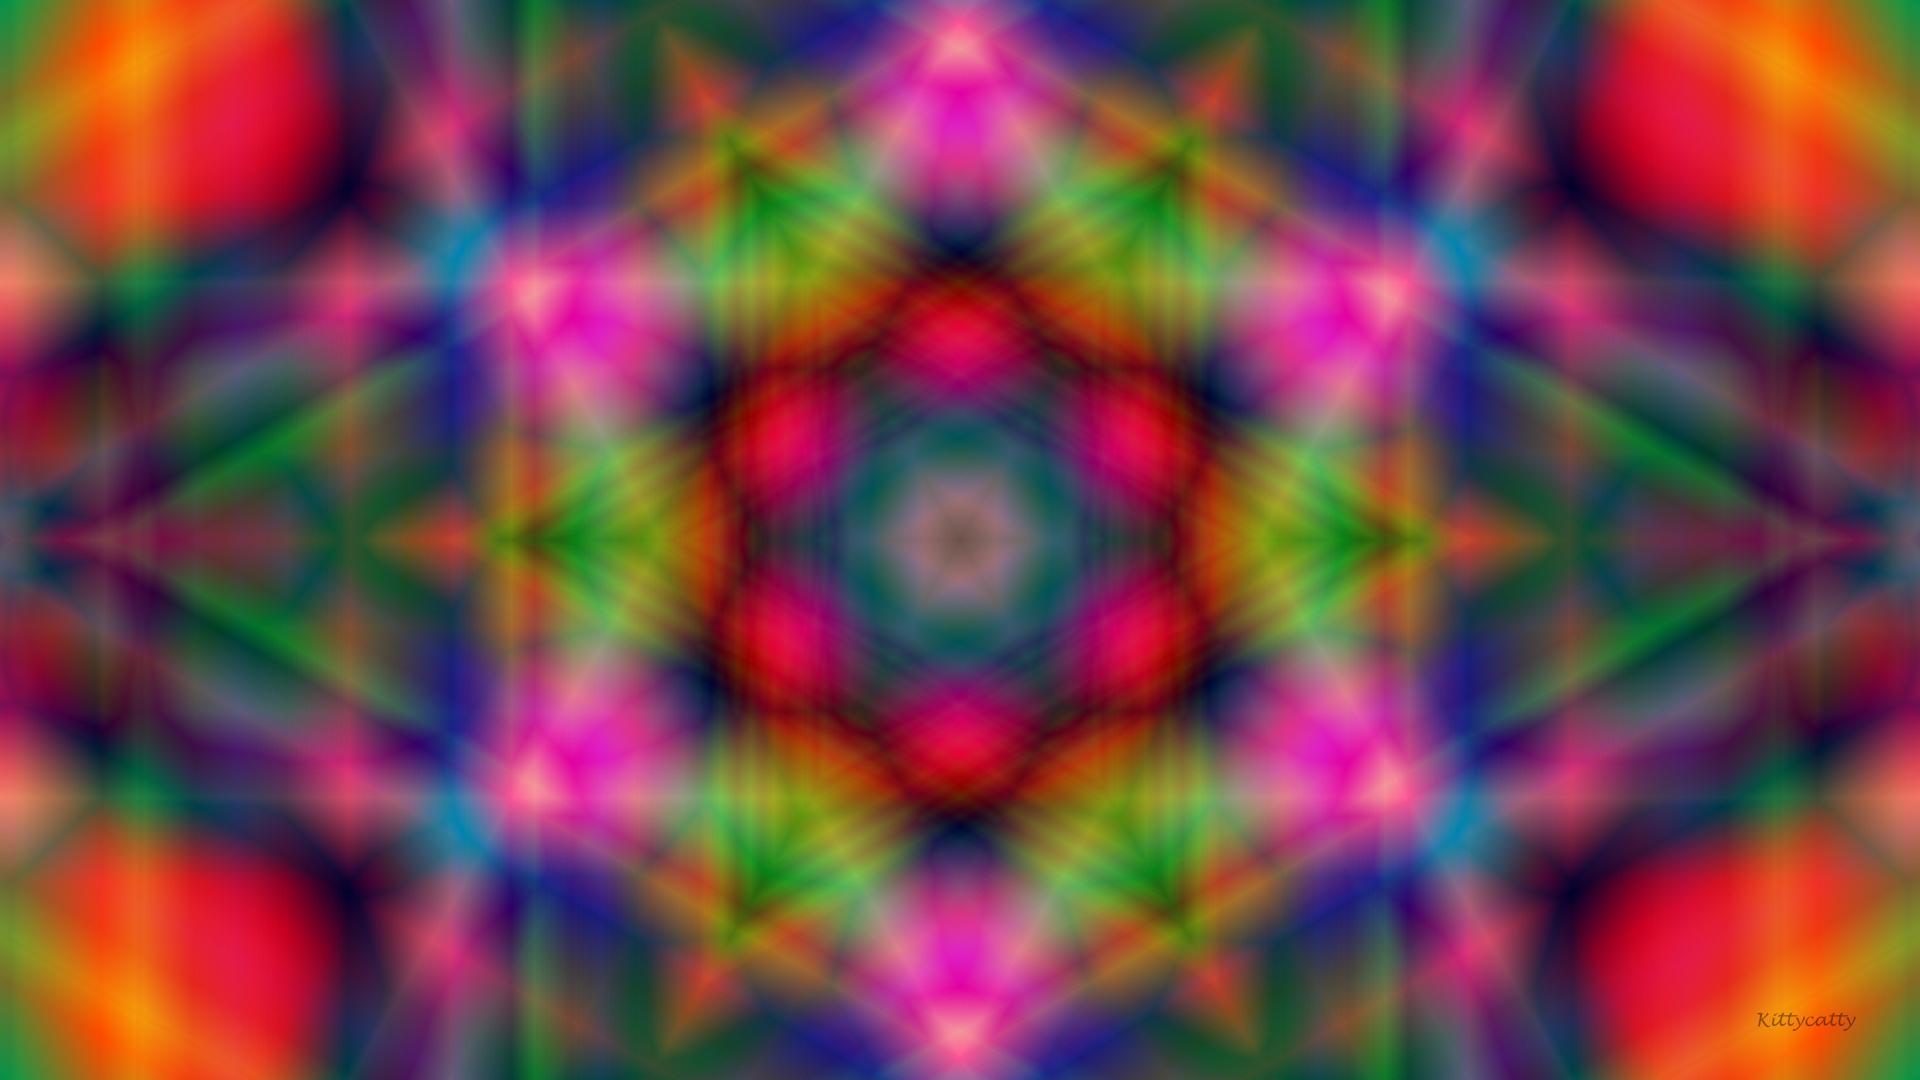 Kaleidoscope Hd Widescreen Wallpaper Wallpapersafari HD Wallpapers Download Free Images Wallpaper [1000image.com]